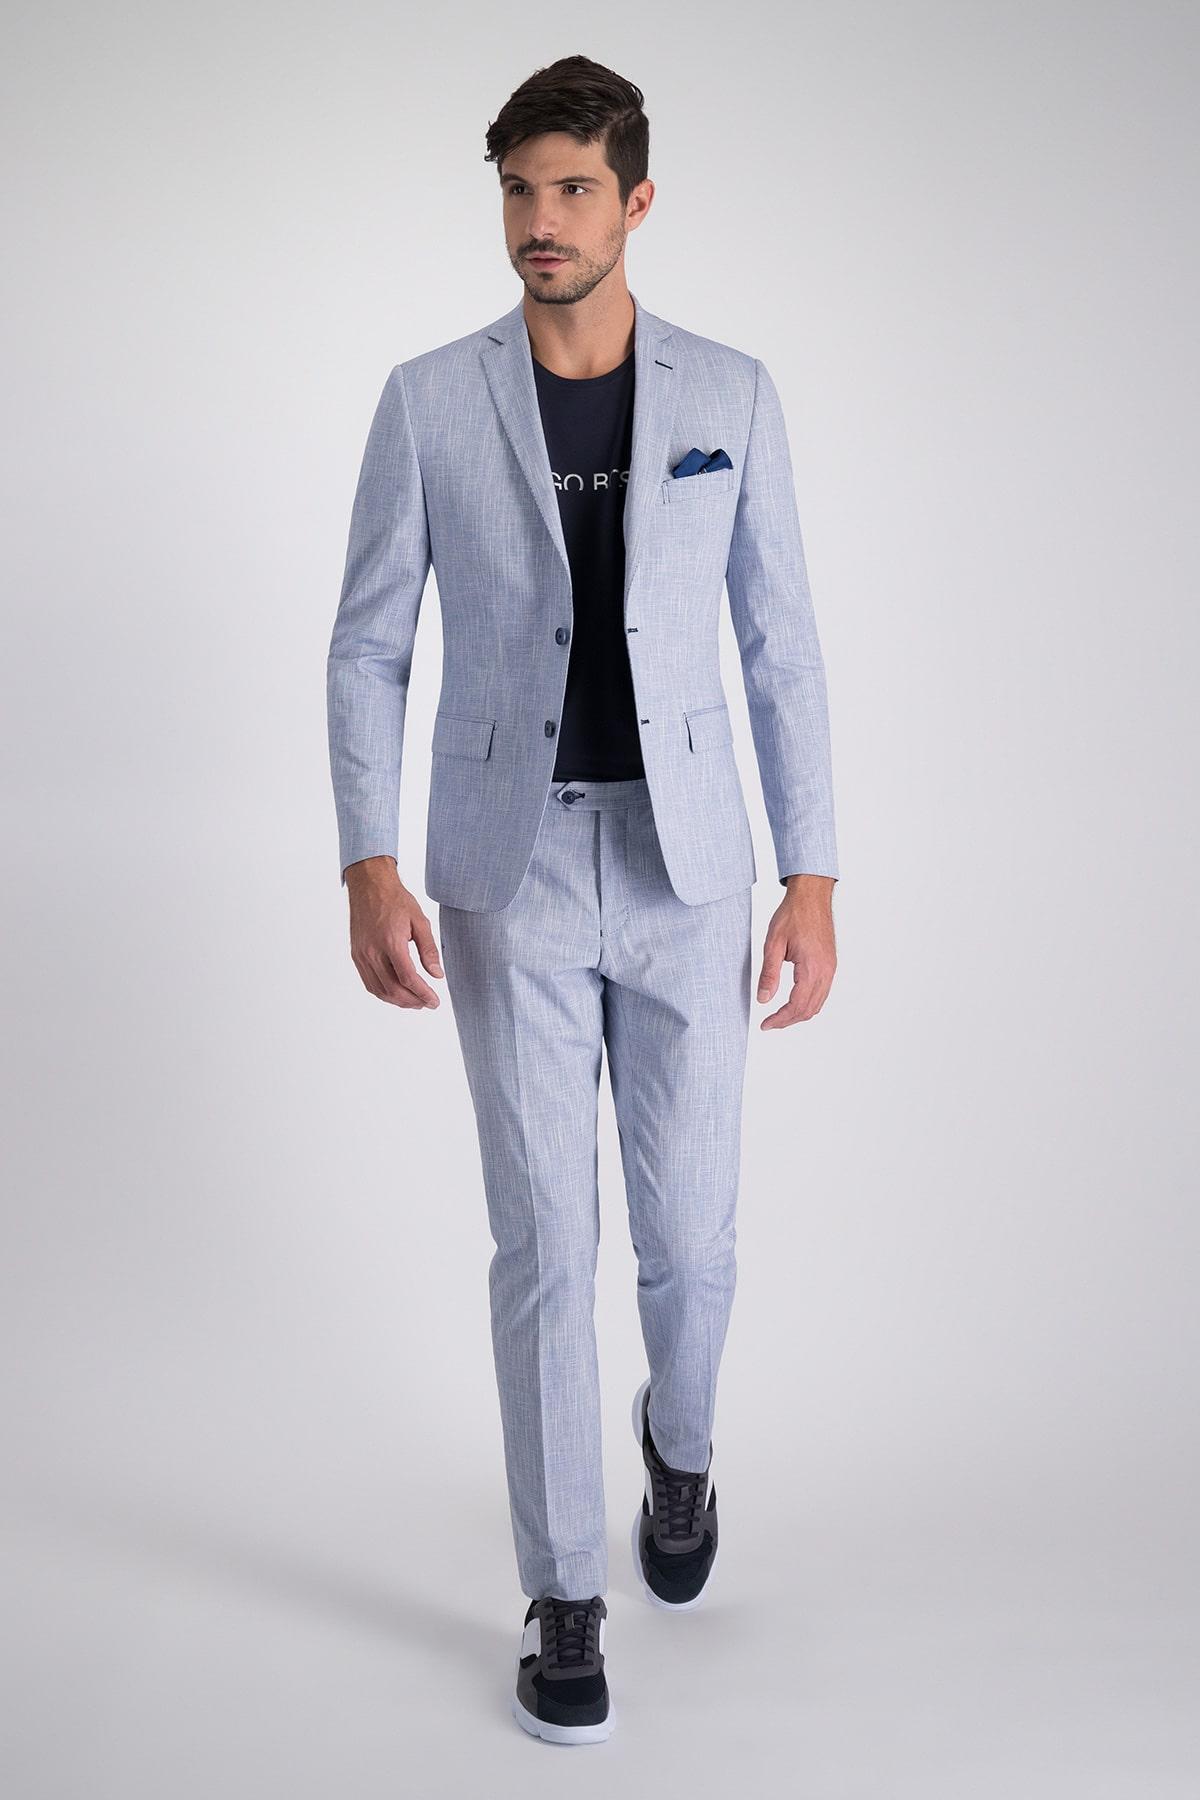 Traje marca HIGH LIFE azul claro con tejido italiano.